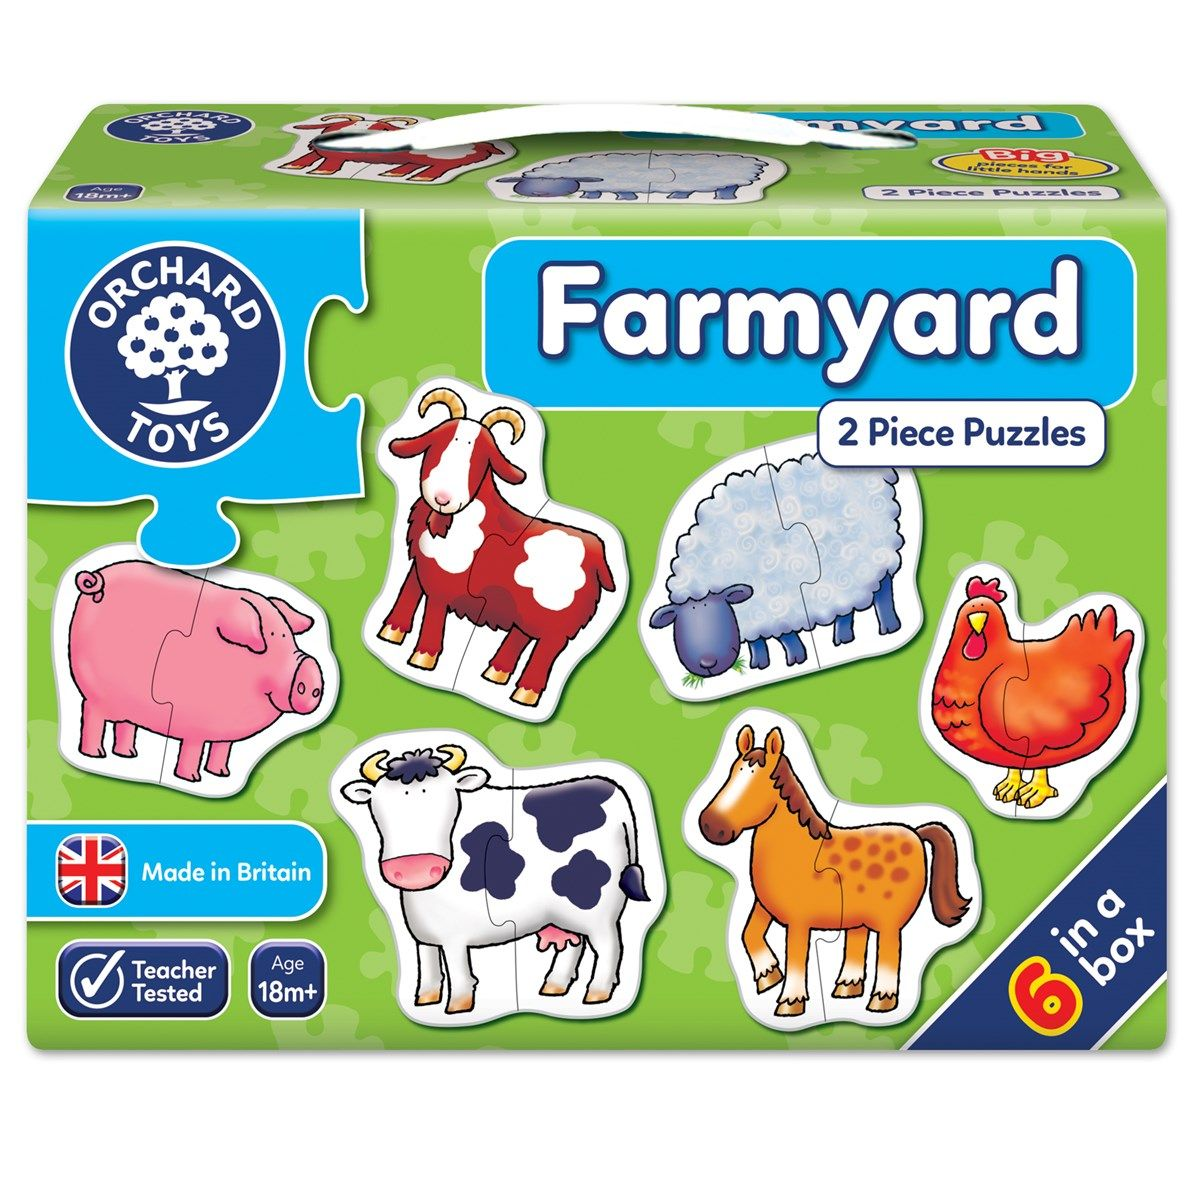 Farmyard Jigsaw Puzzle   Shaped Jigsaw Puzzles   Pinterest